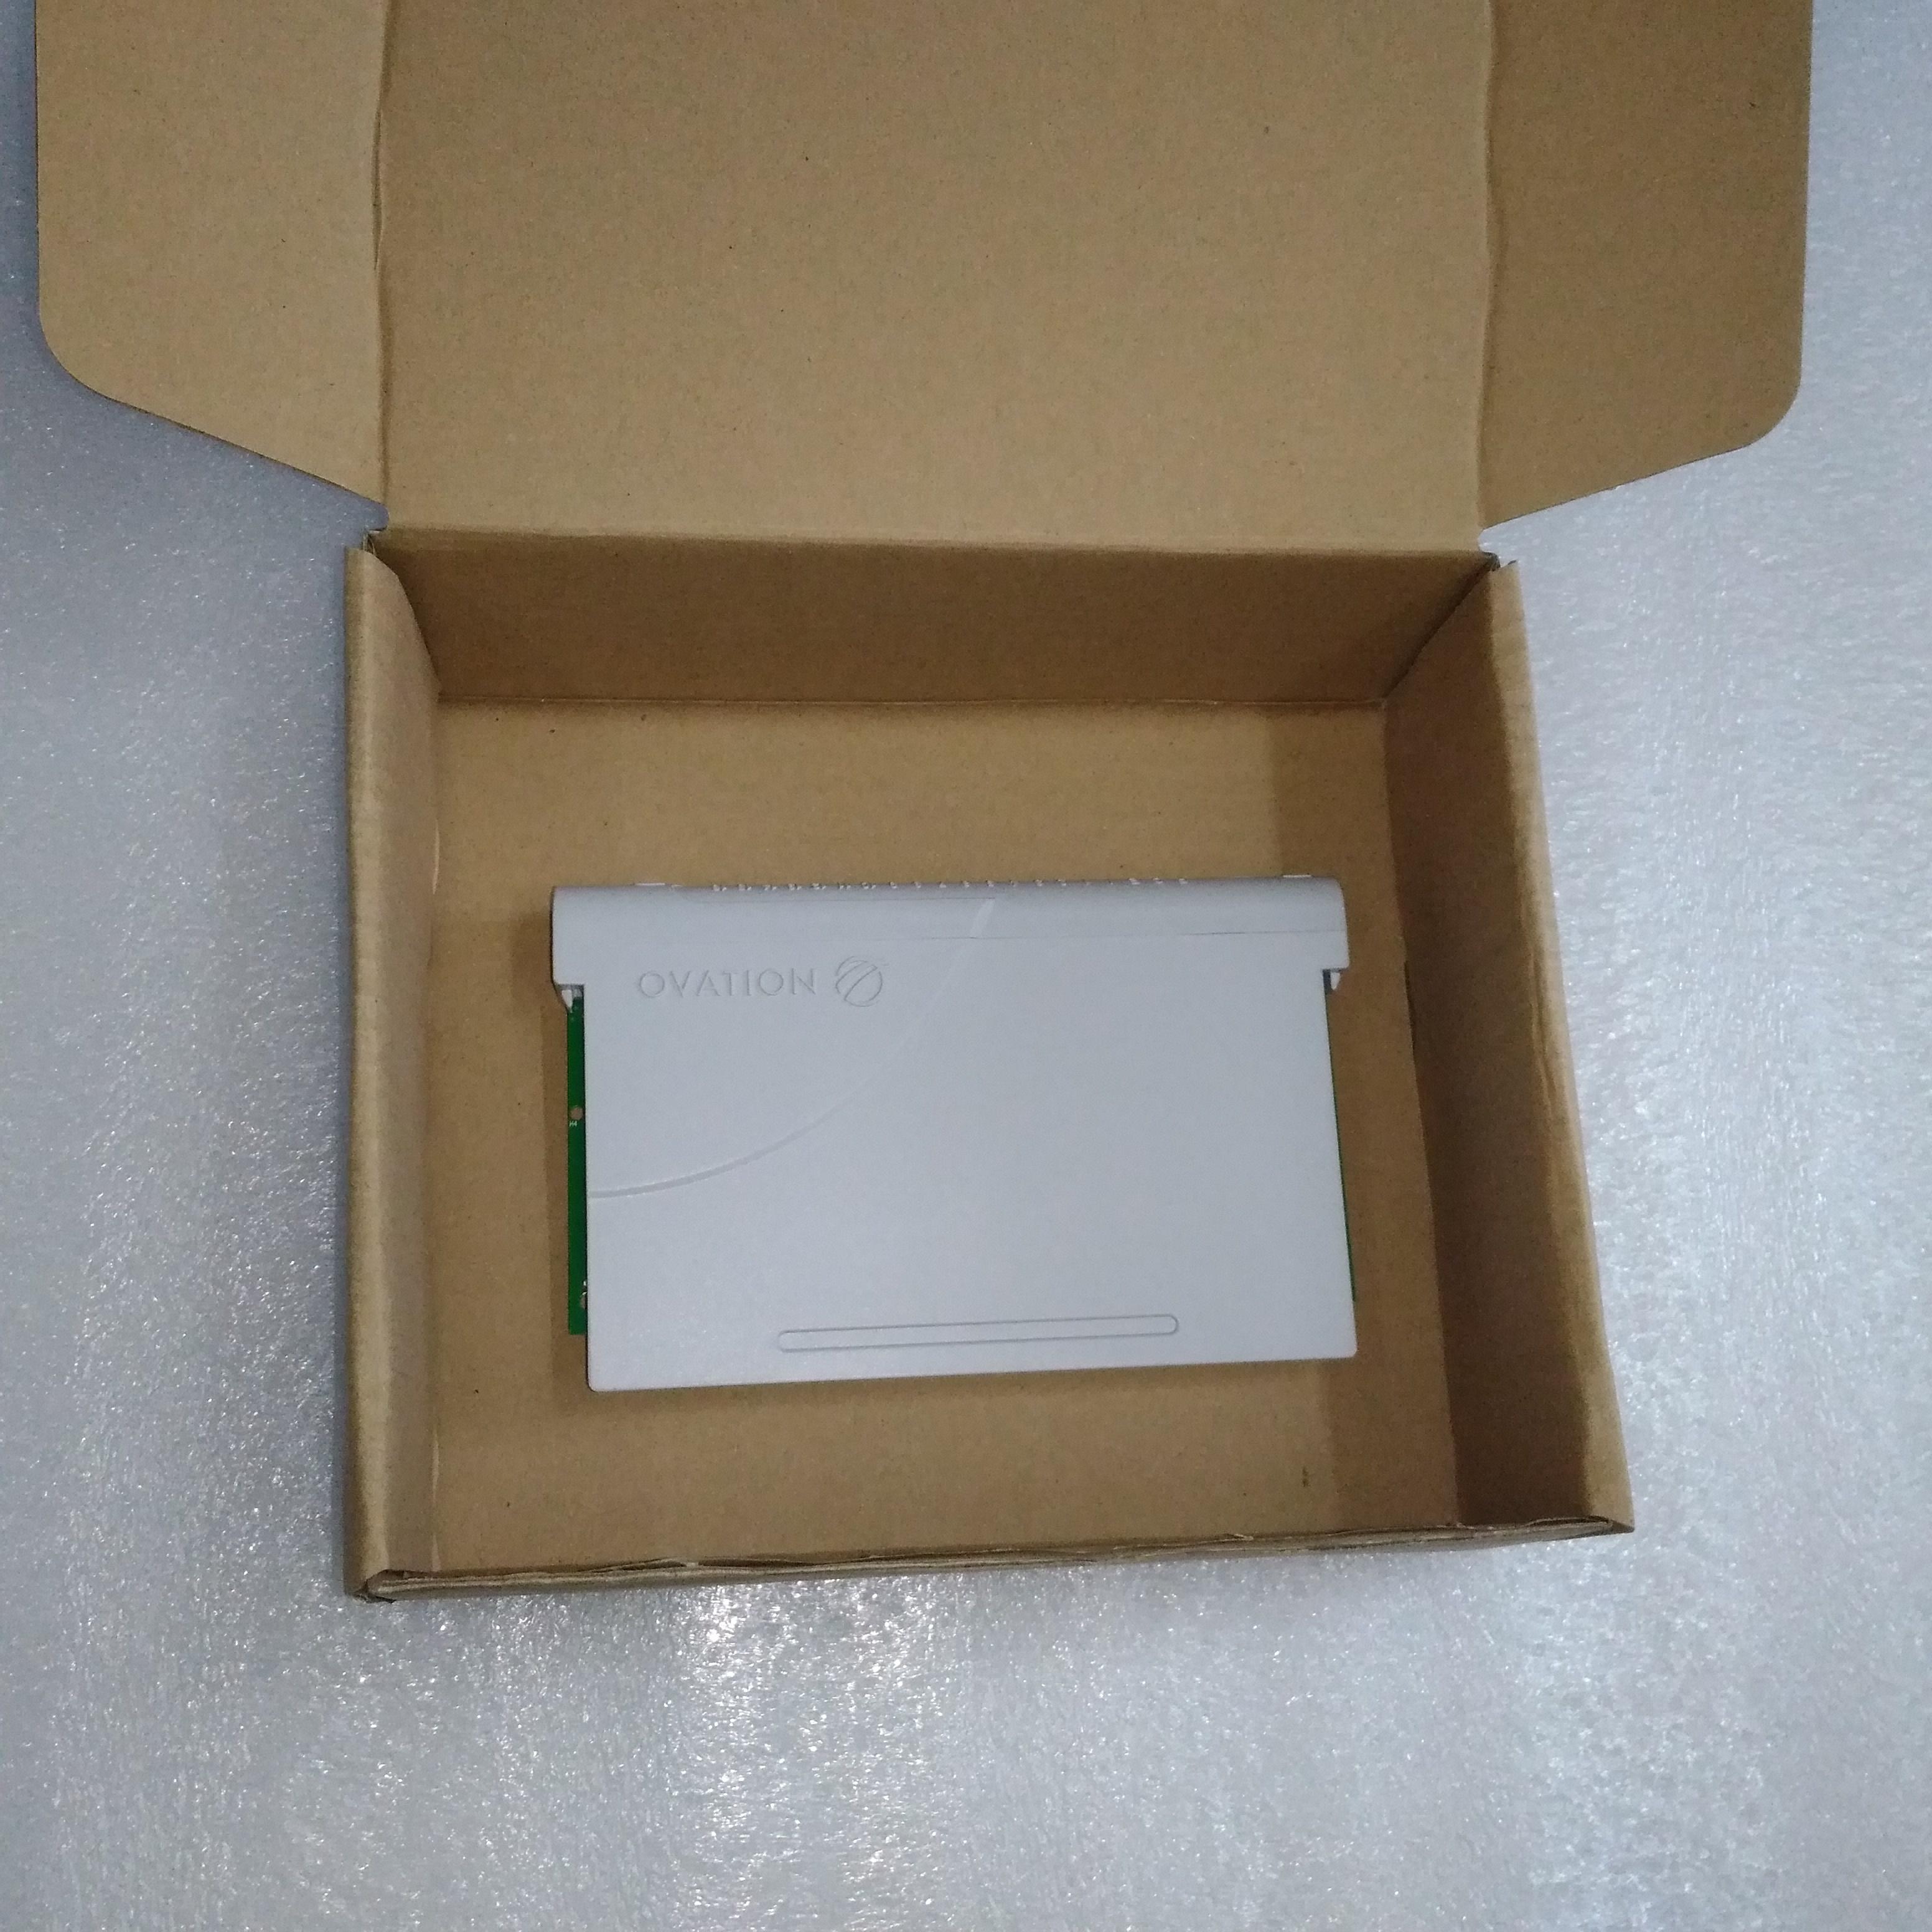 Allen Bradley Micro PLC 1C31147G01 Exporter, Supplier and